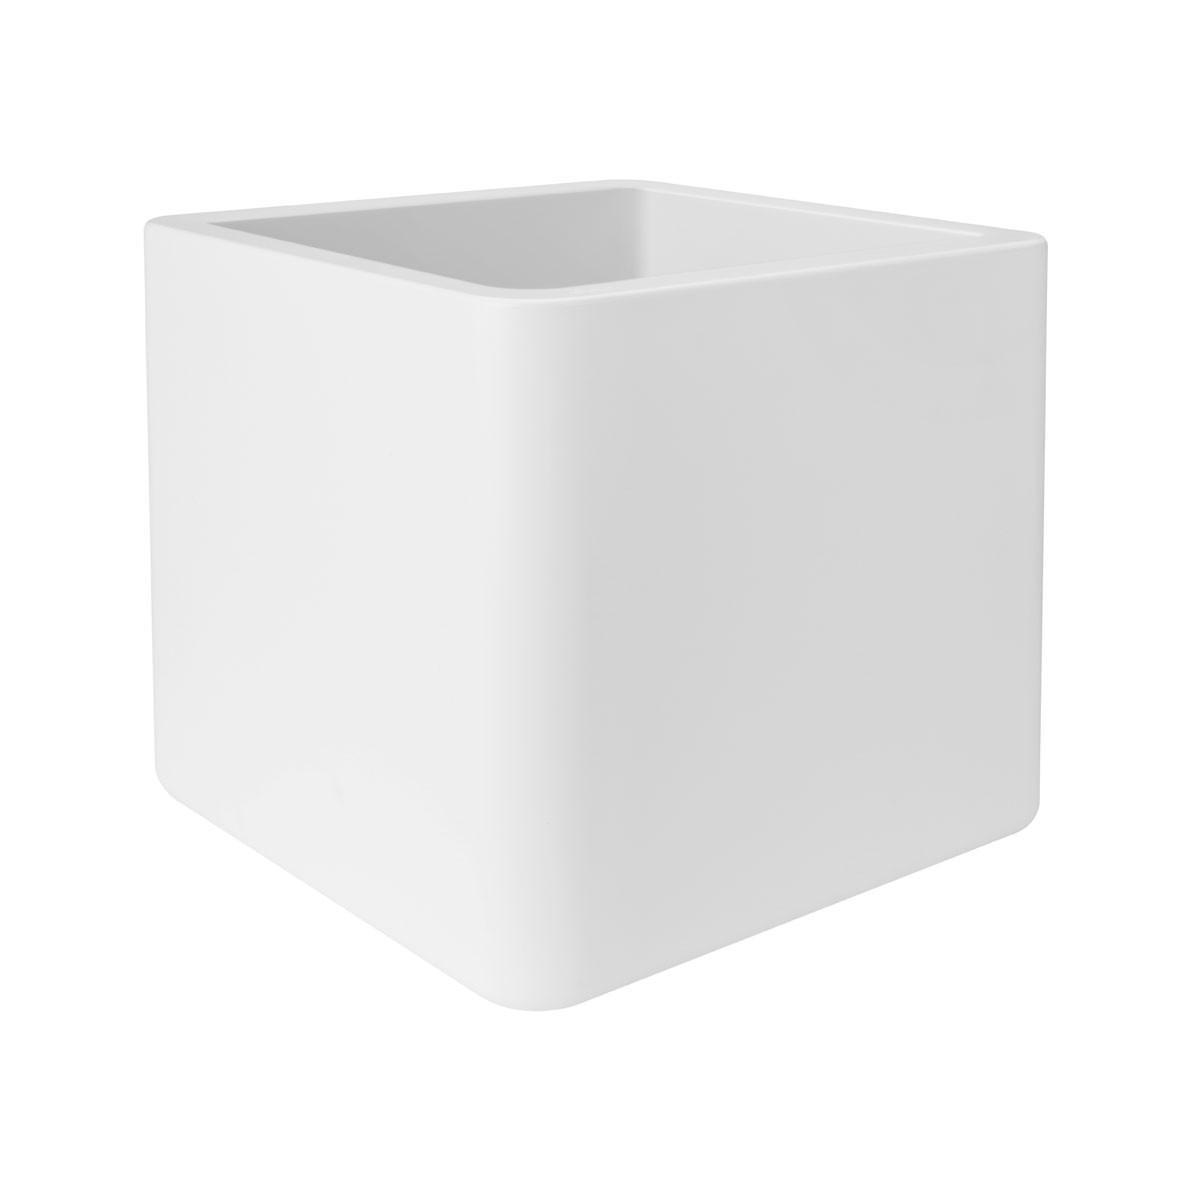 Pflanzgefäß / Pflanzkasten elho Pure Soft Brick 50x50x49cm weiß Bild 1